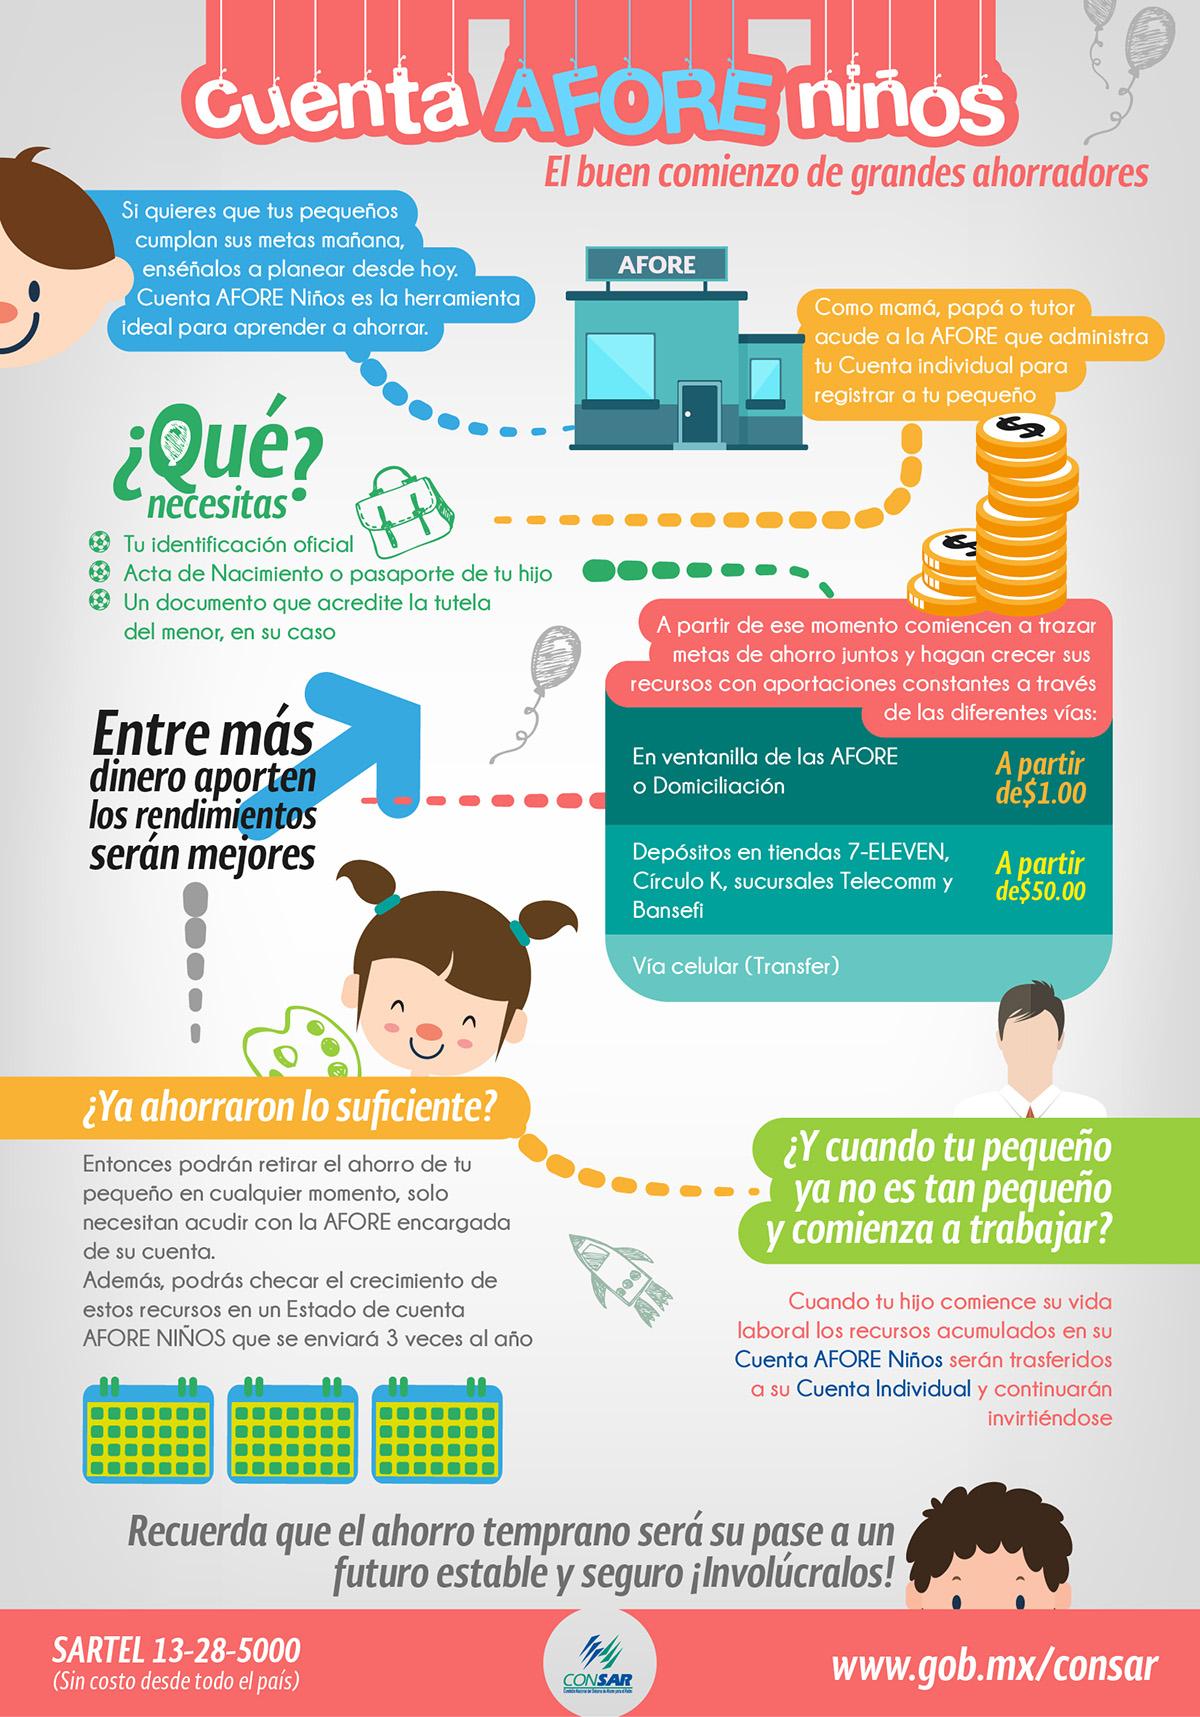 /cms/uploads/image/file/234538/Infograf_a_Cuenta_AFORE__ni_os.jpg